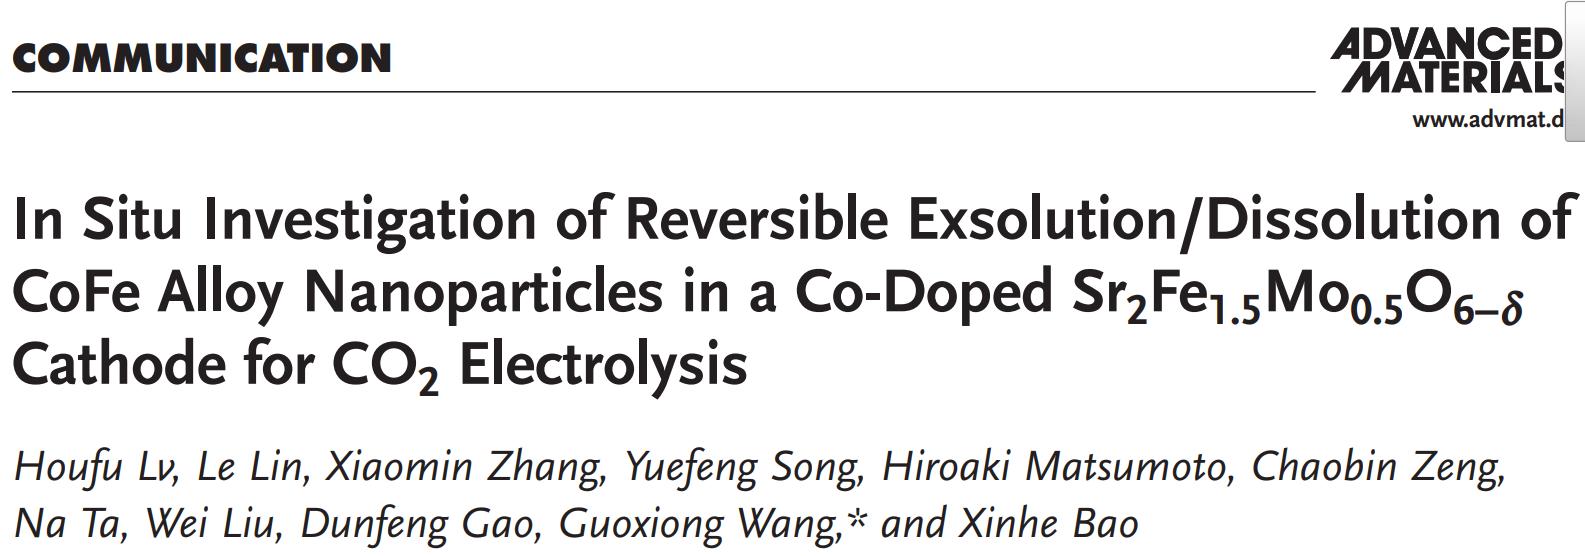 原位探究Sr2Fe1.5Mo0.5O6-δ阴极中CoFe合金在CO2电解过程中可逆的溶出/溶解过程